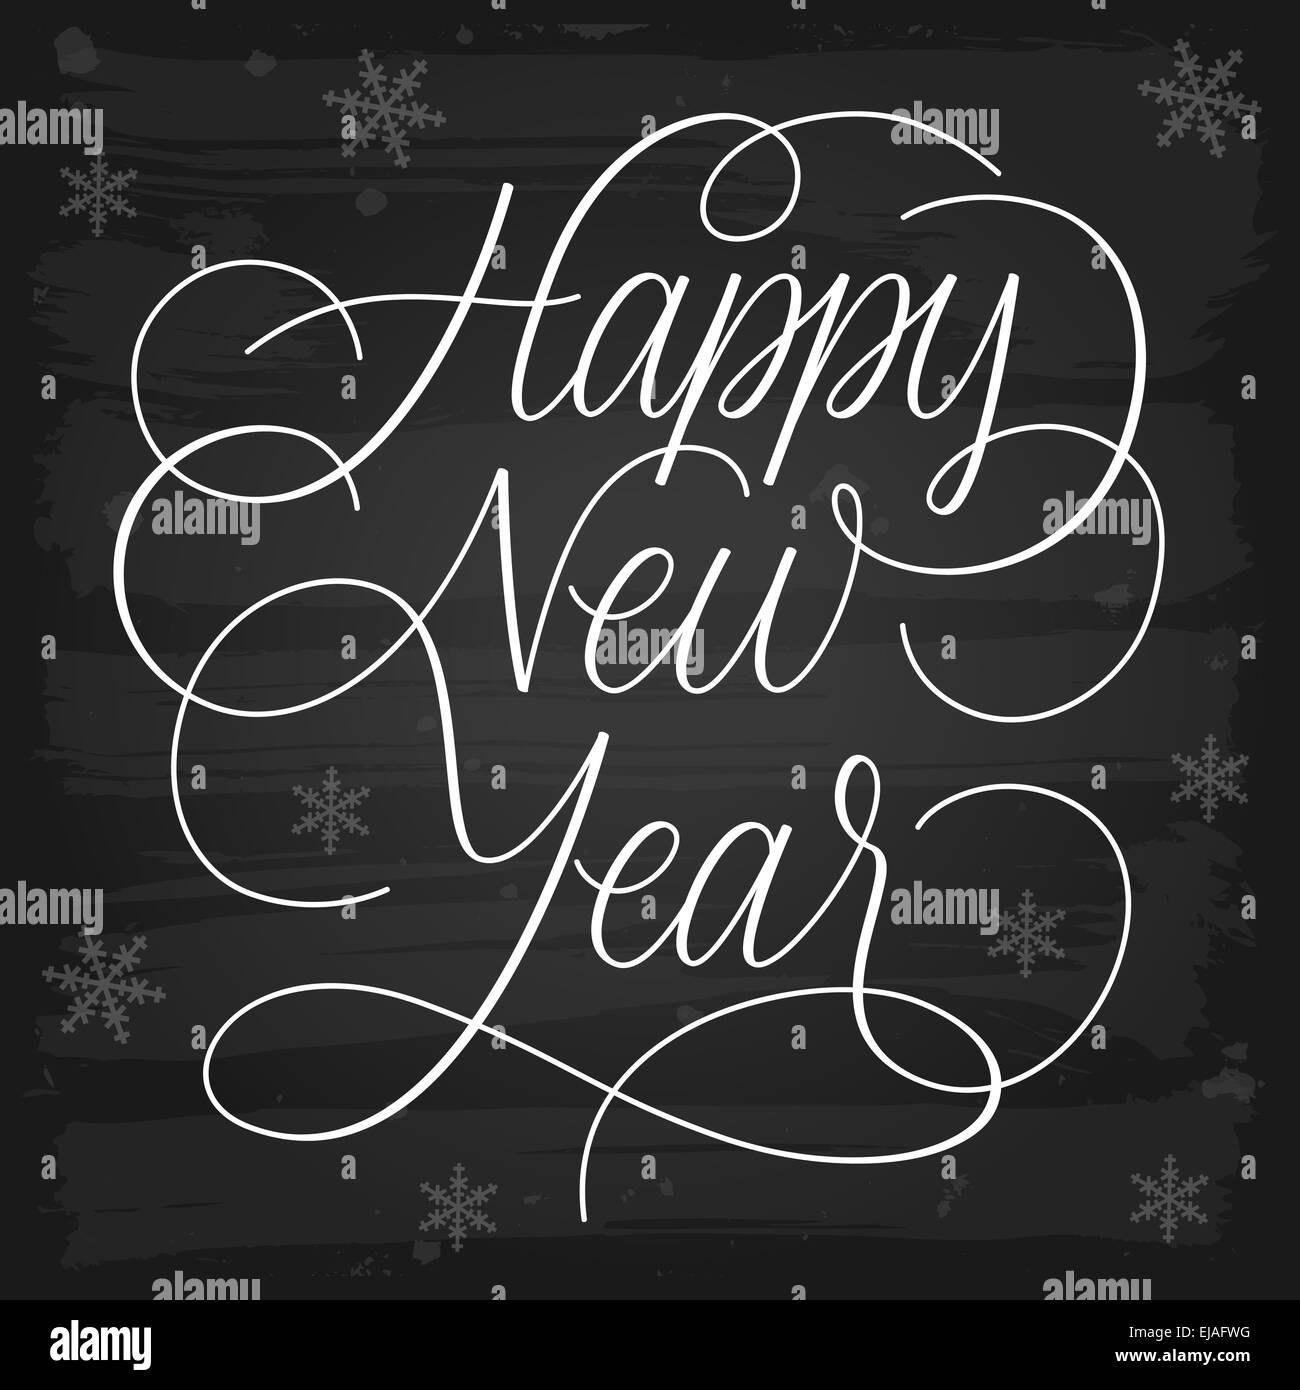 happy new year greetings chalkboard stock image